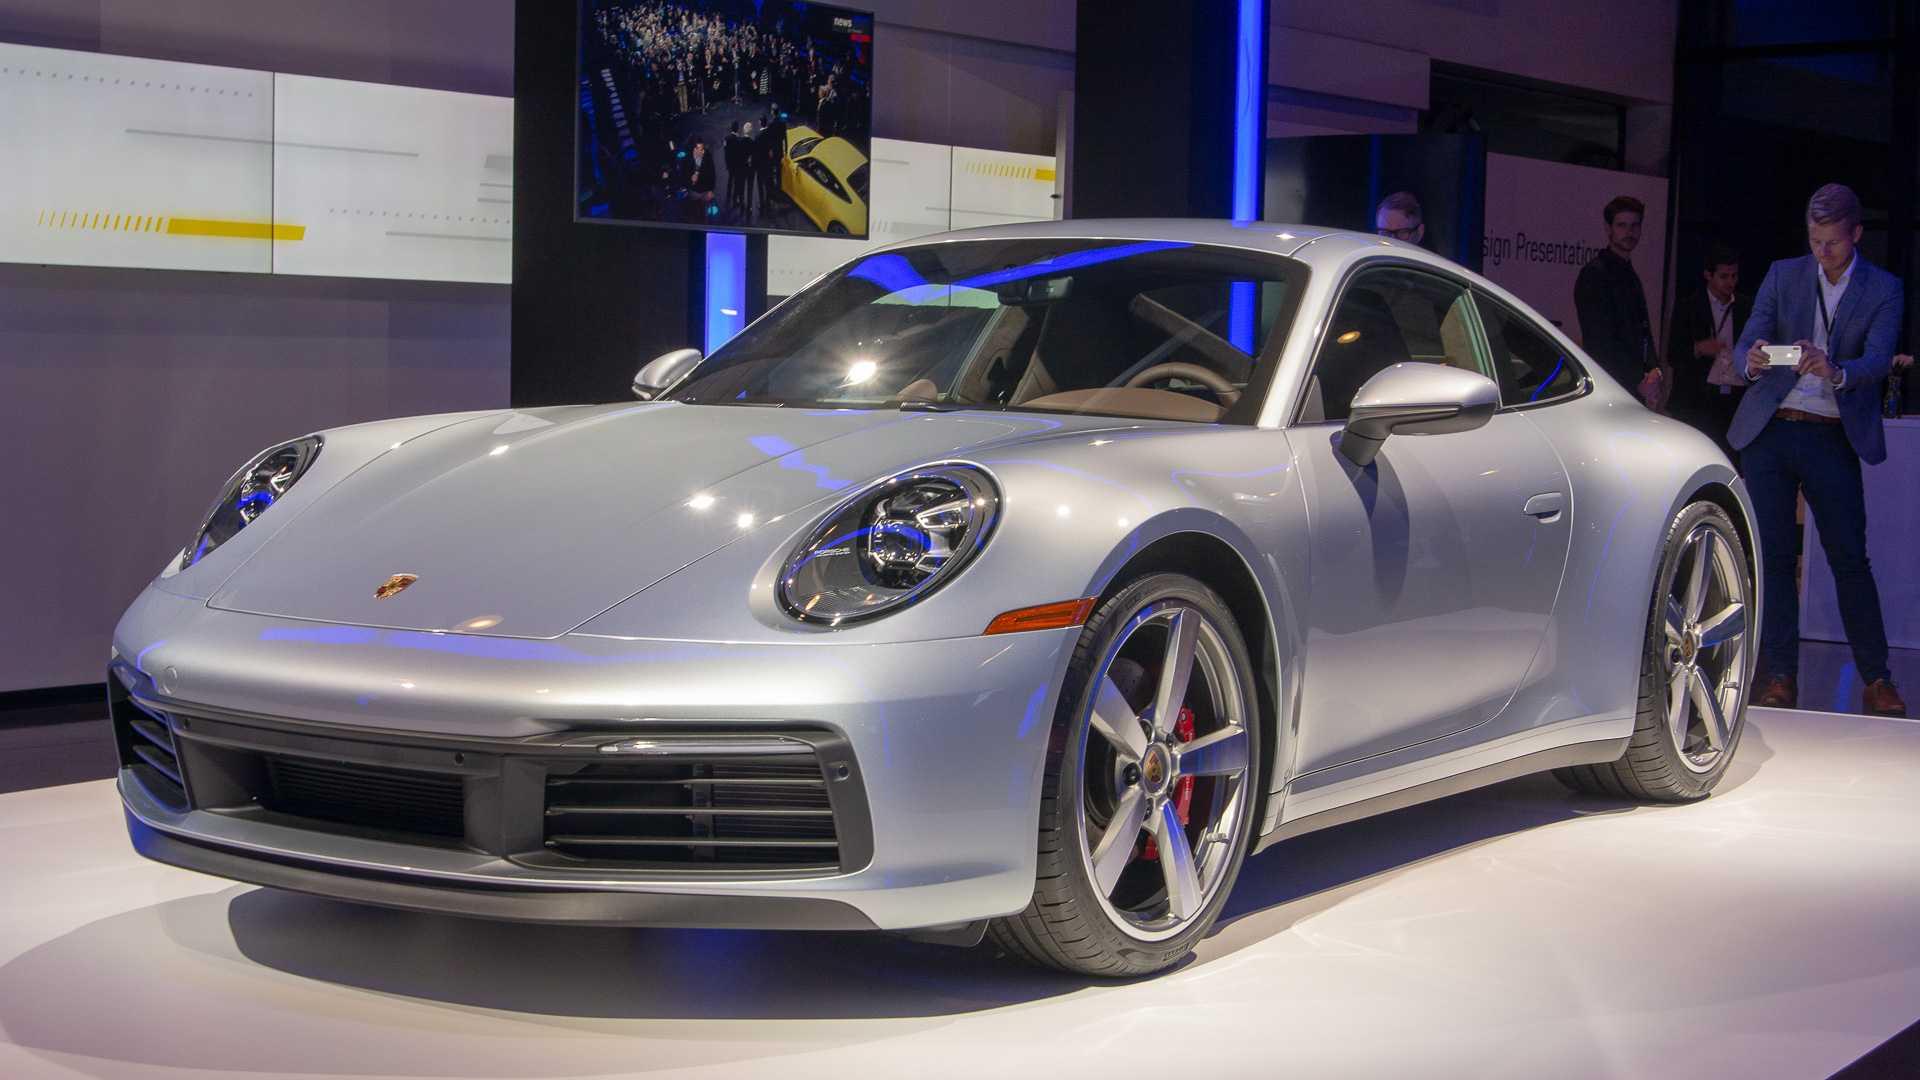 31 Best Review Porsche Modelle 2020 Model for Porsche Modelle 2020